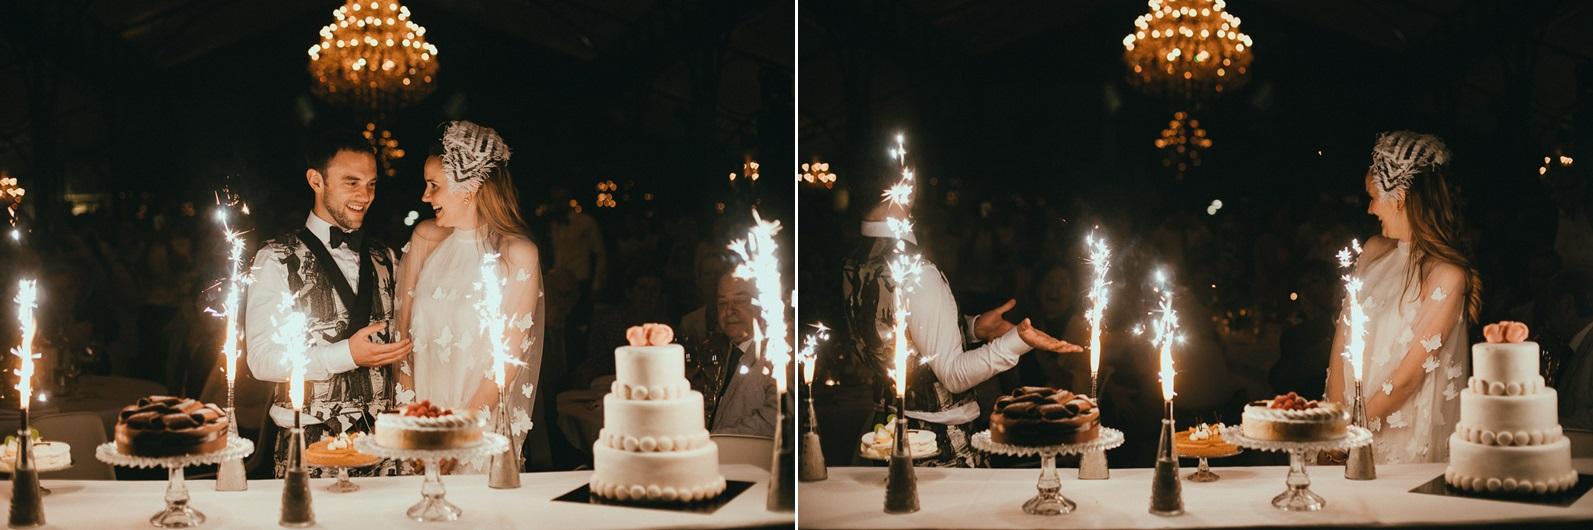 chateau-wedding-photography (157).jpg